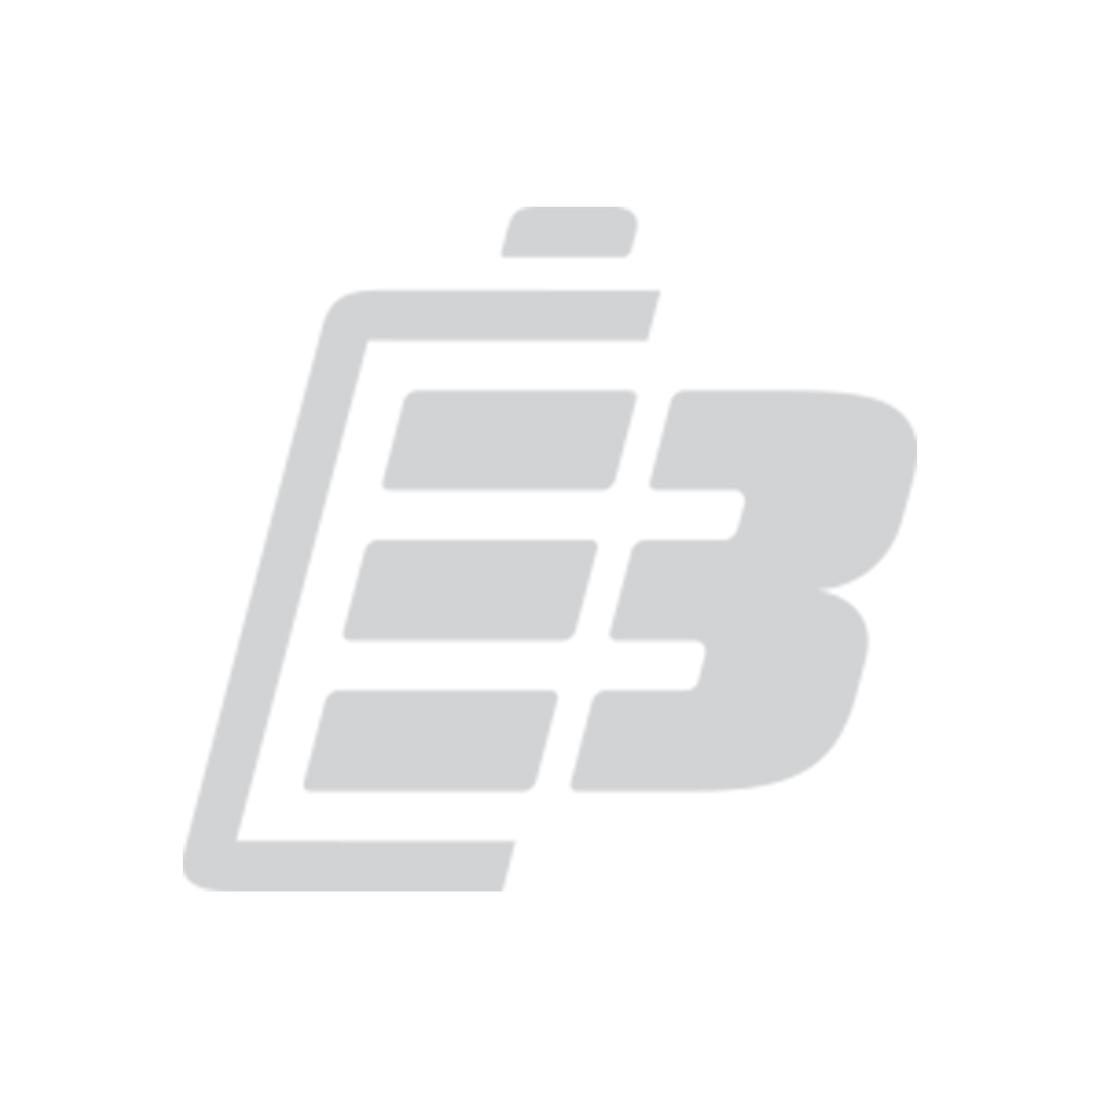 Minwa MW8210 DC Universal Adaptor_1